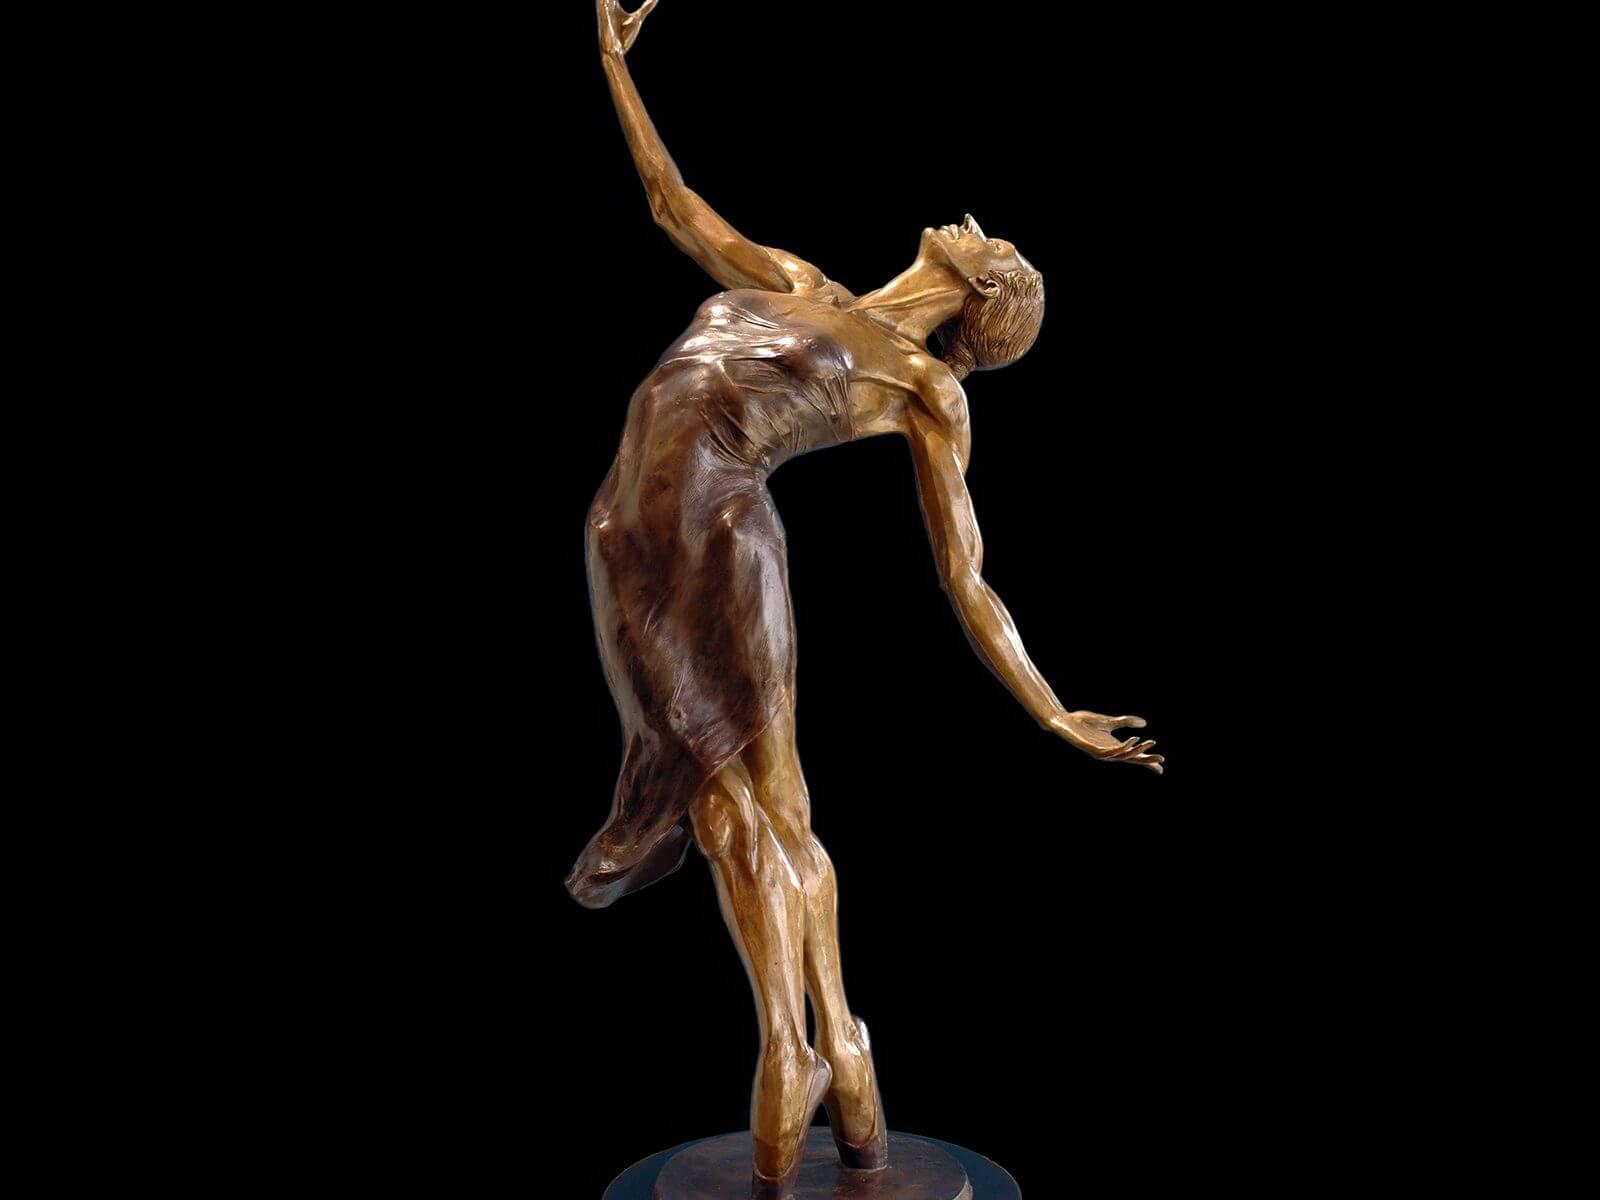 Pleiades a half life size female figurative bronze ballet dancer by sculptor Andrew DeVries